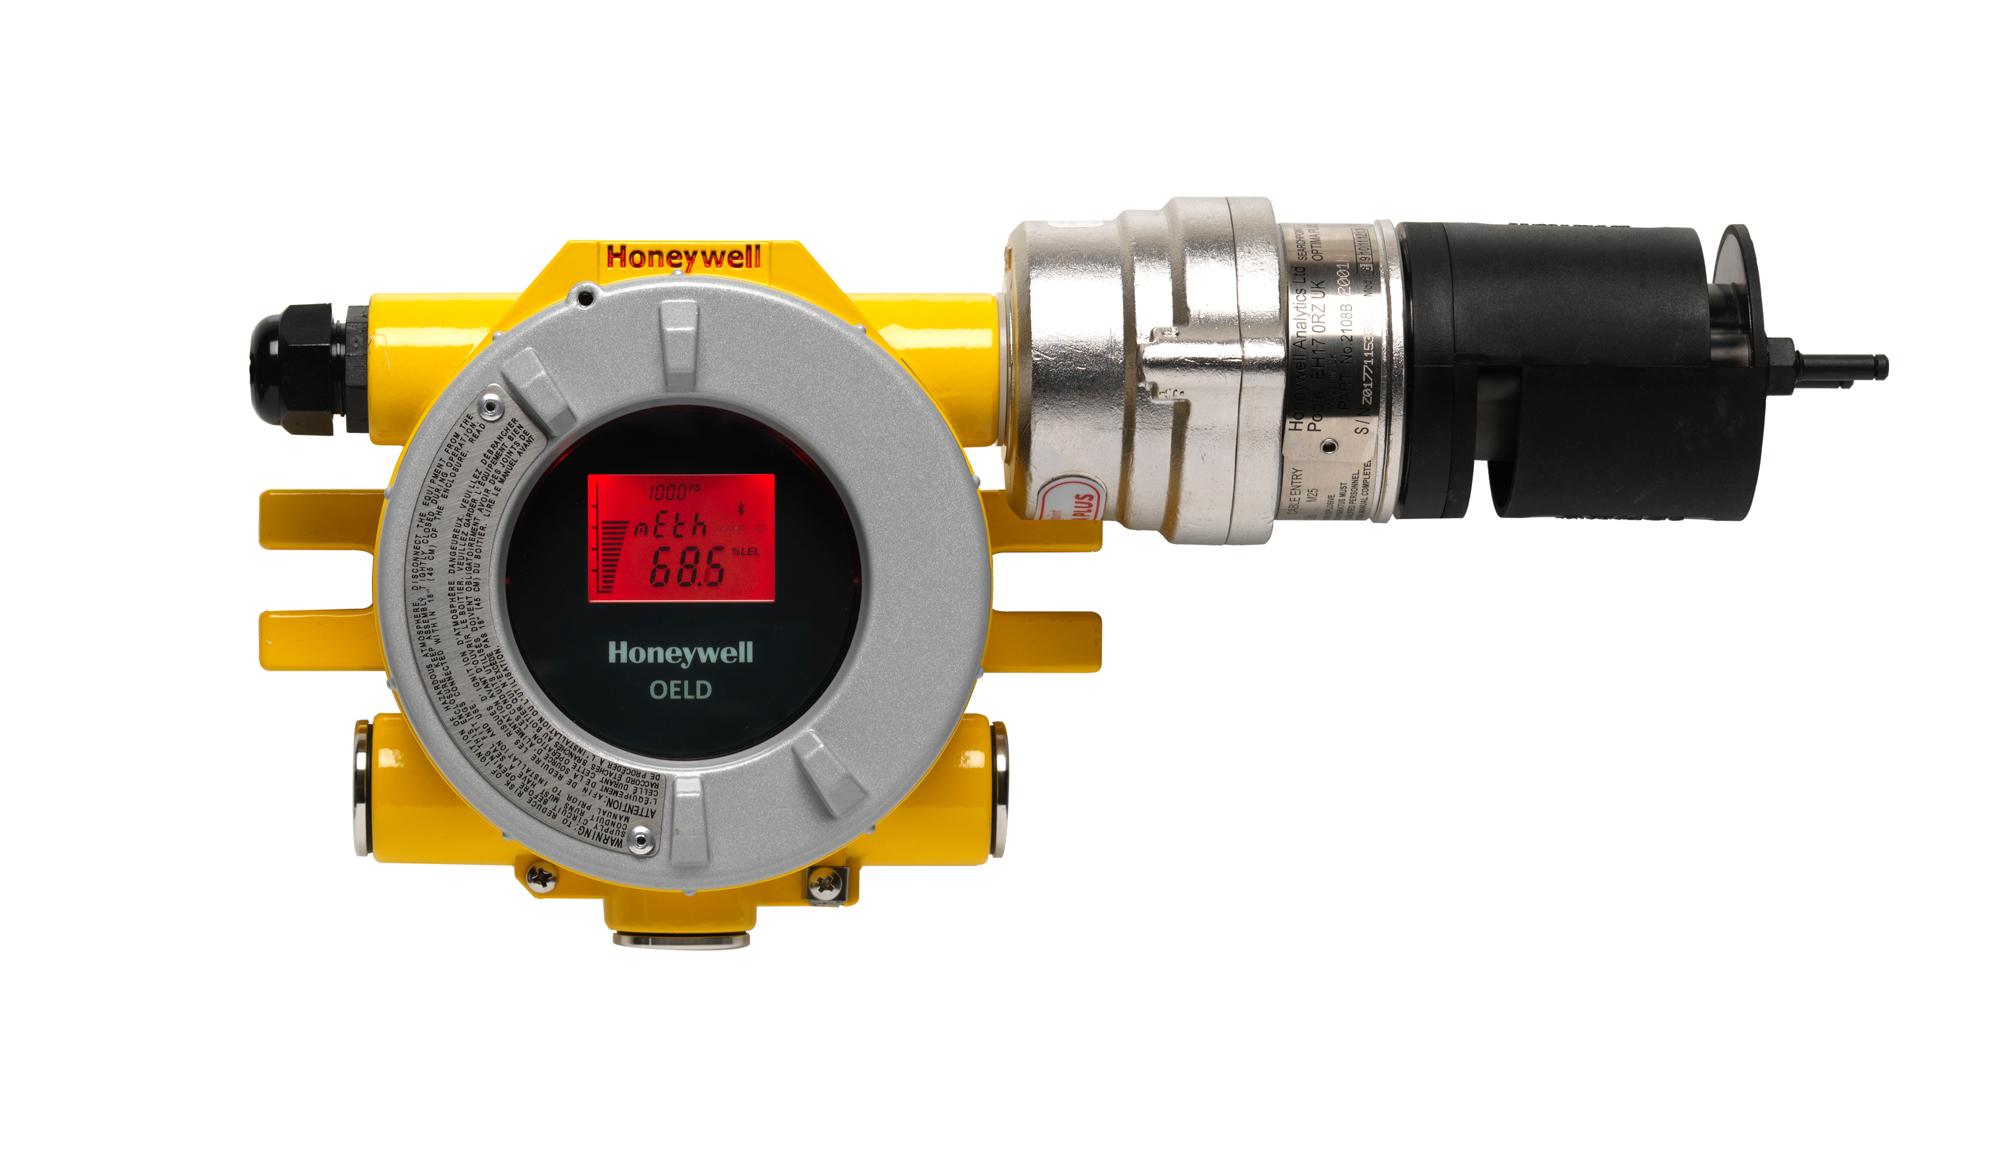 Honeywell Optima gas detector